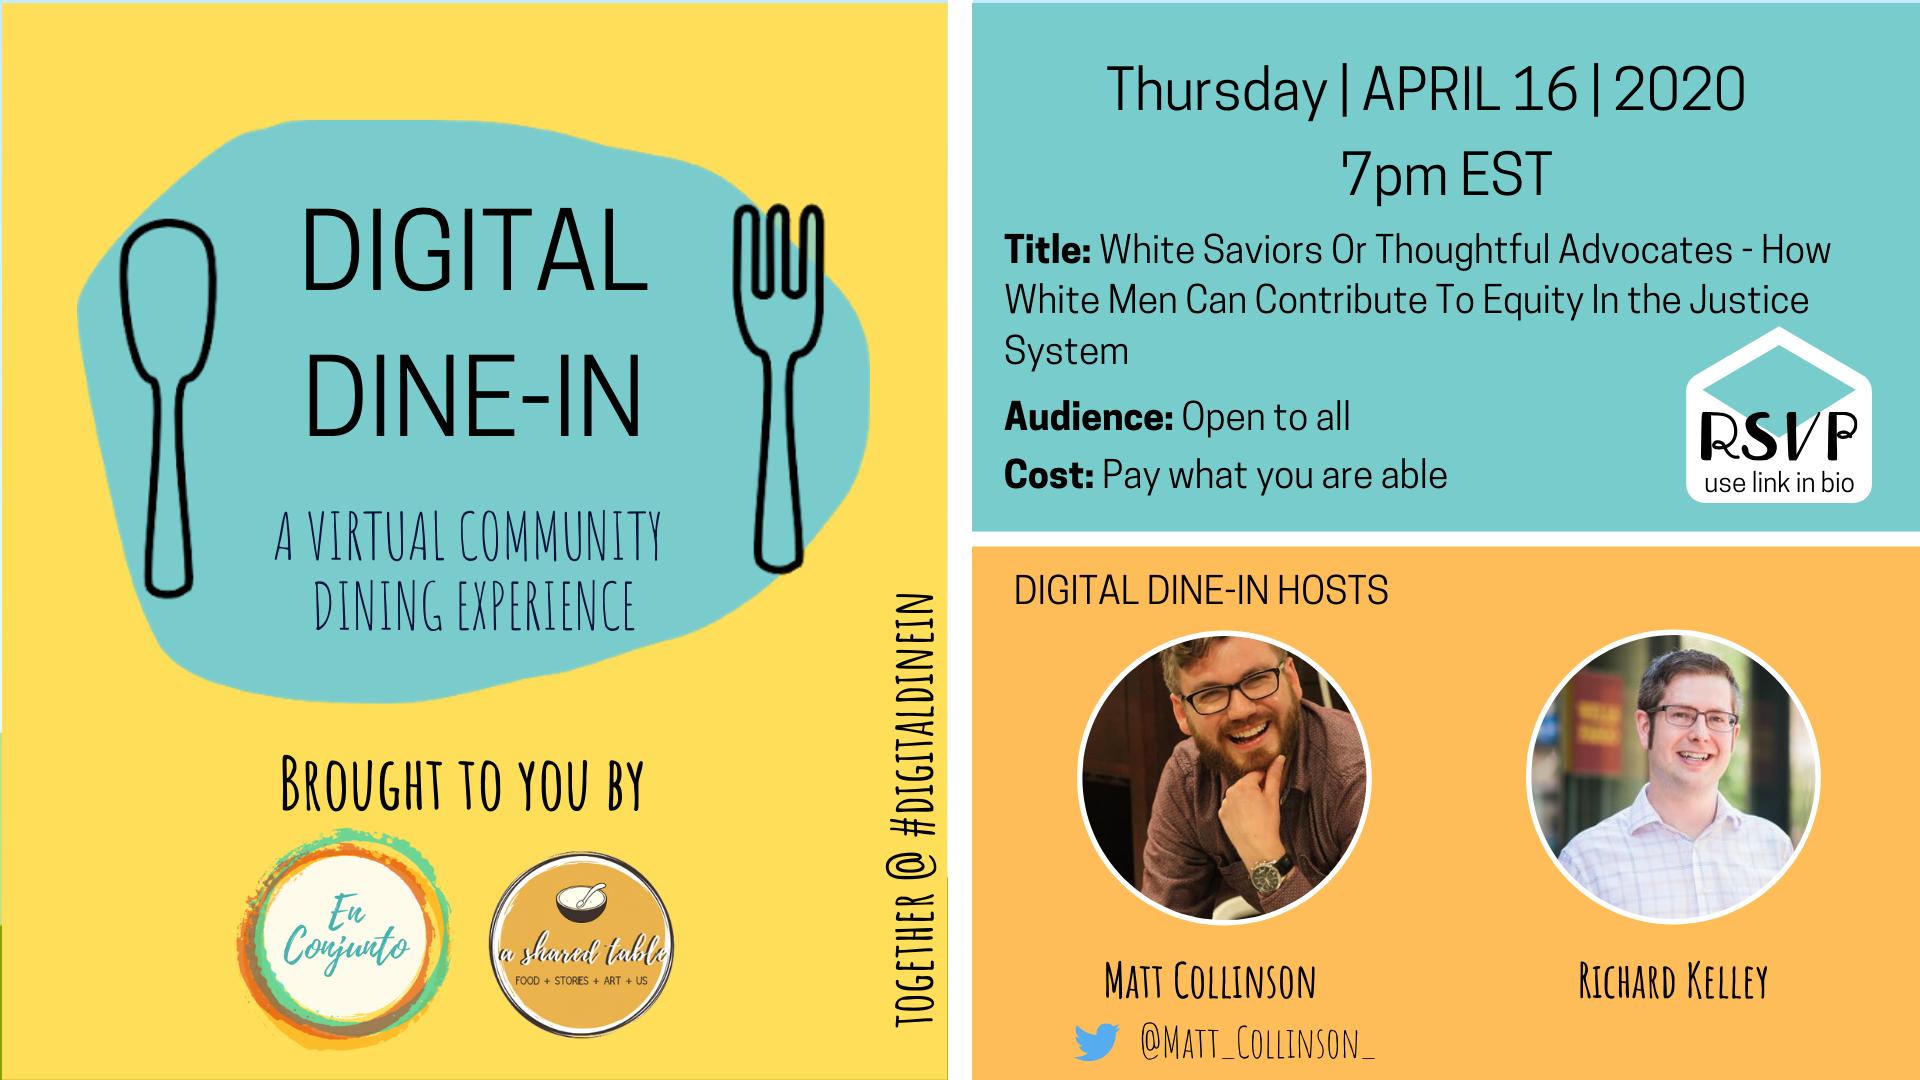 April 16 Digital Dine In Description